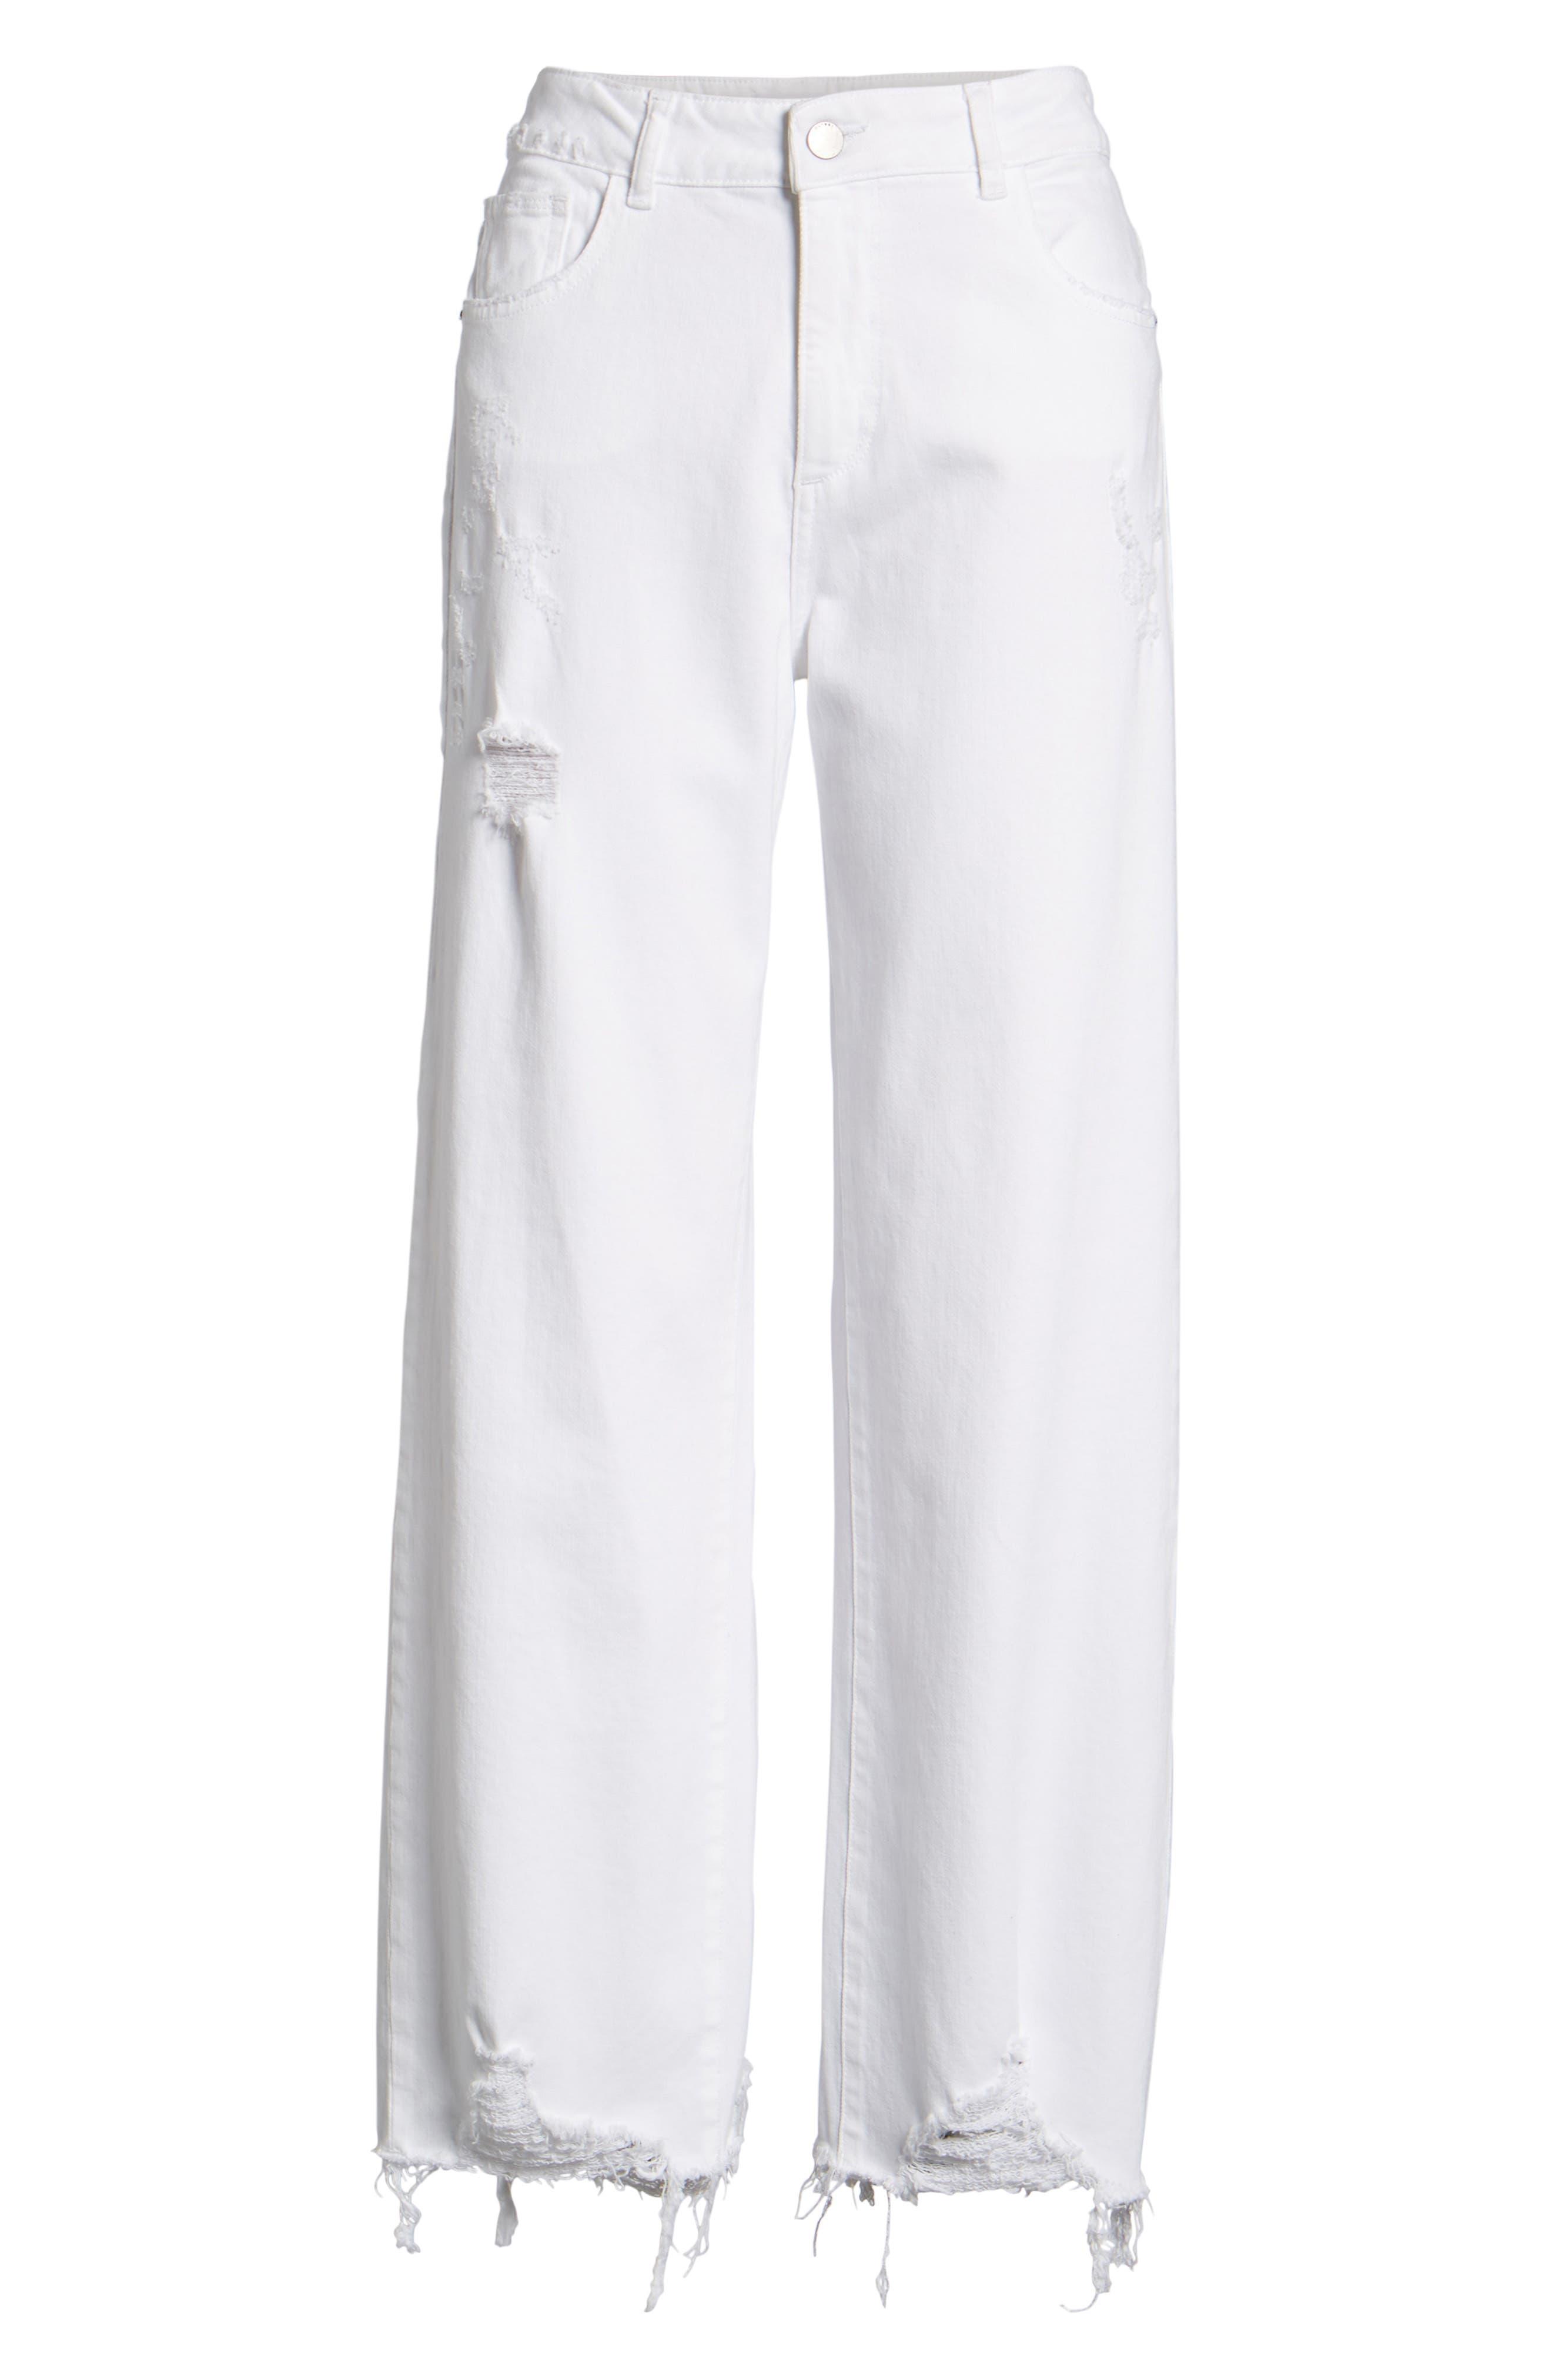 Hepburn High Waist Wide Leg Jeans,                             Alternate thumbnail 7, color,                             100